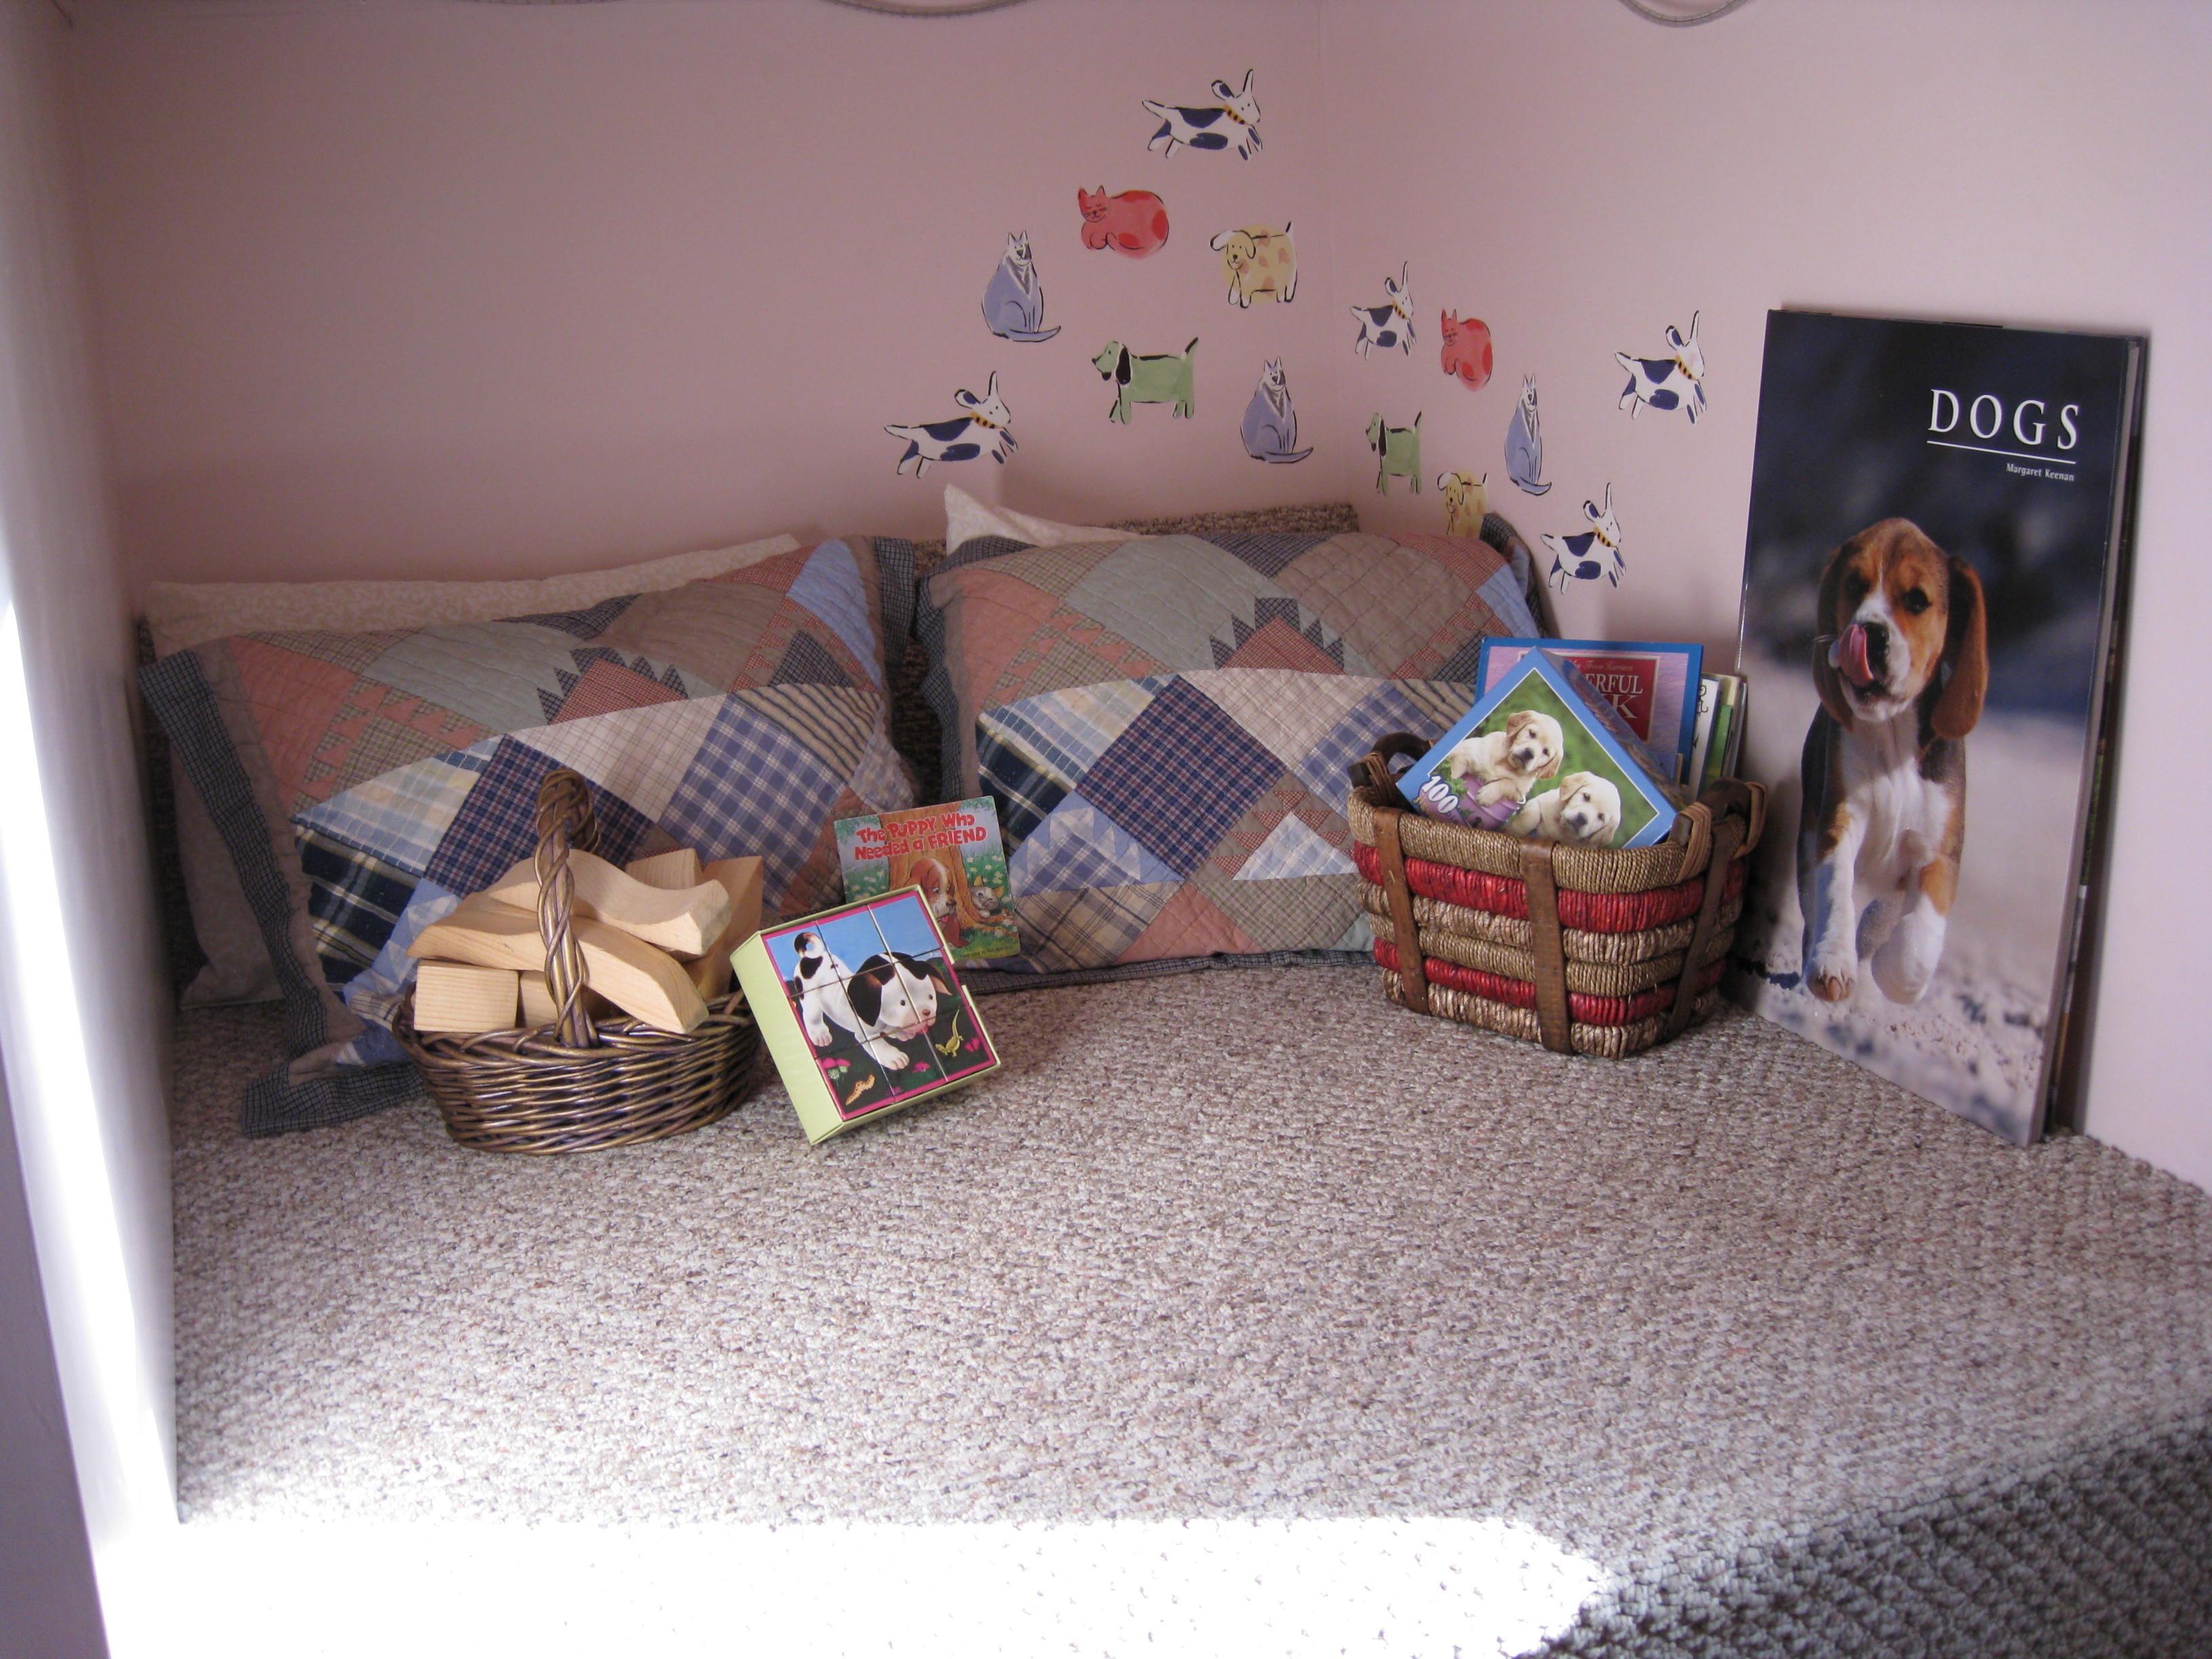 The Room Located In The Dogu0027s Nose.u0026nbsp;. Dog Bark Park Inn